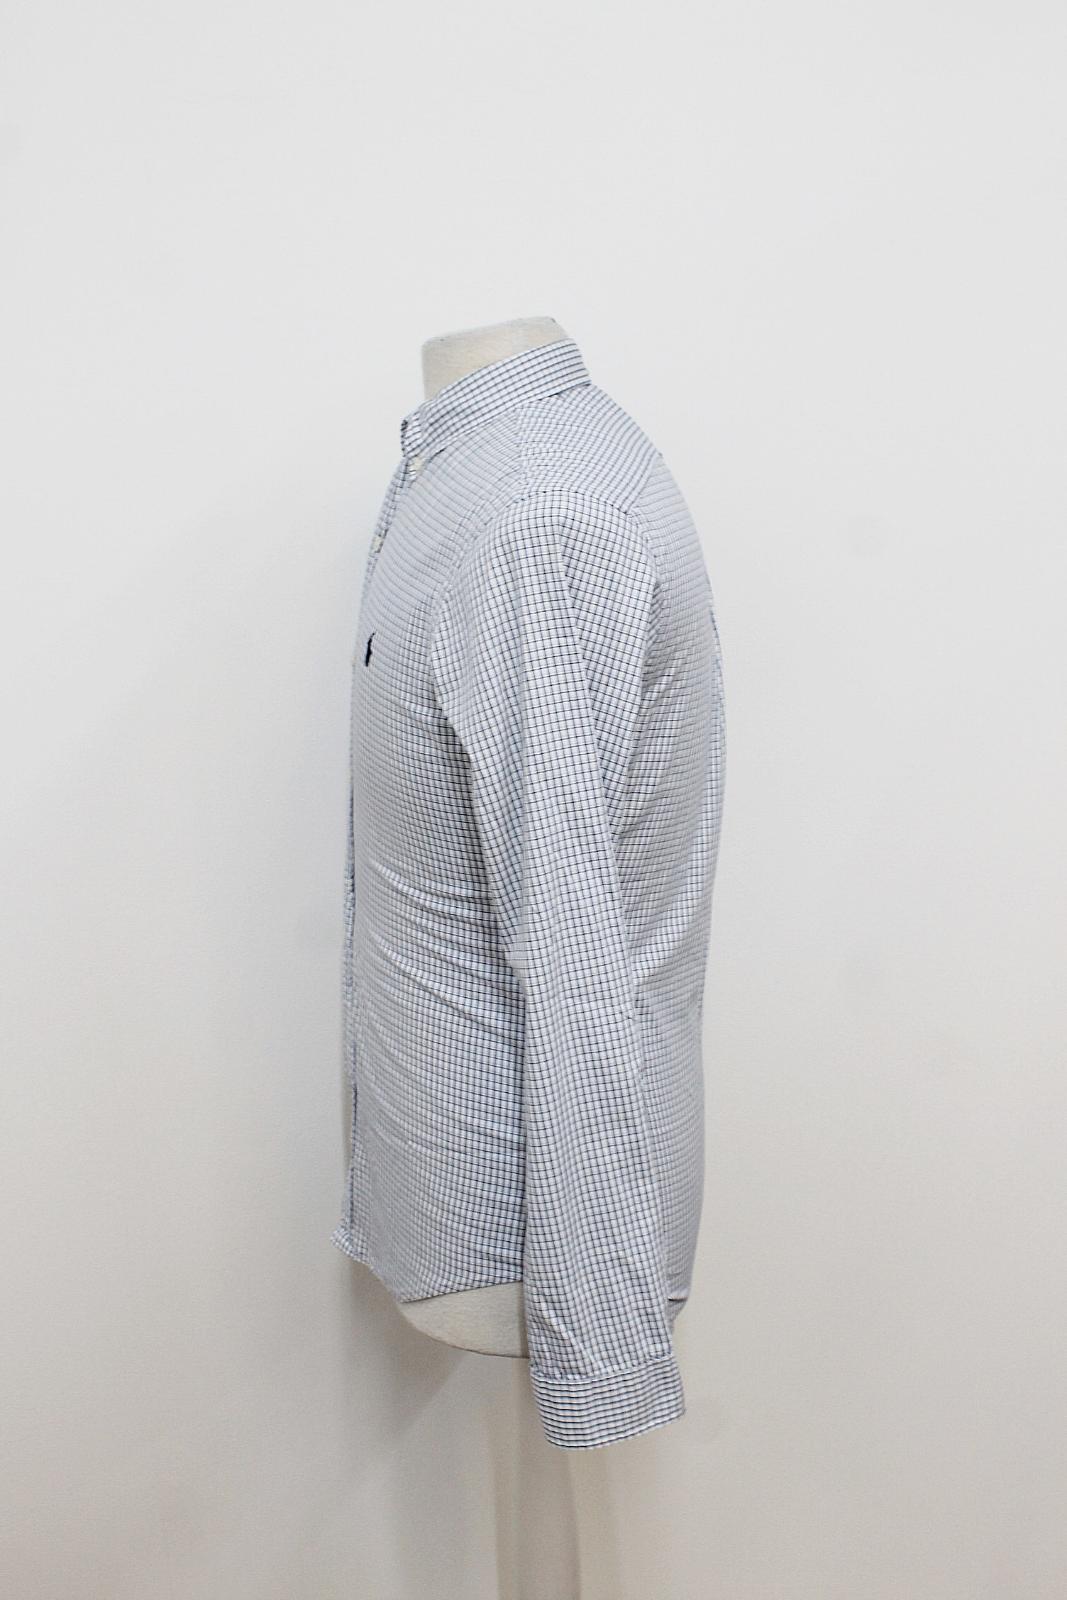 Polo-Ralph-Lauren-Para-Hombres-Blanco-Negro-Azul-Camisa-De-Patron-De-Cuadros-Slim-Fit-Talla-S miniatura 5